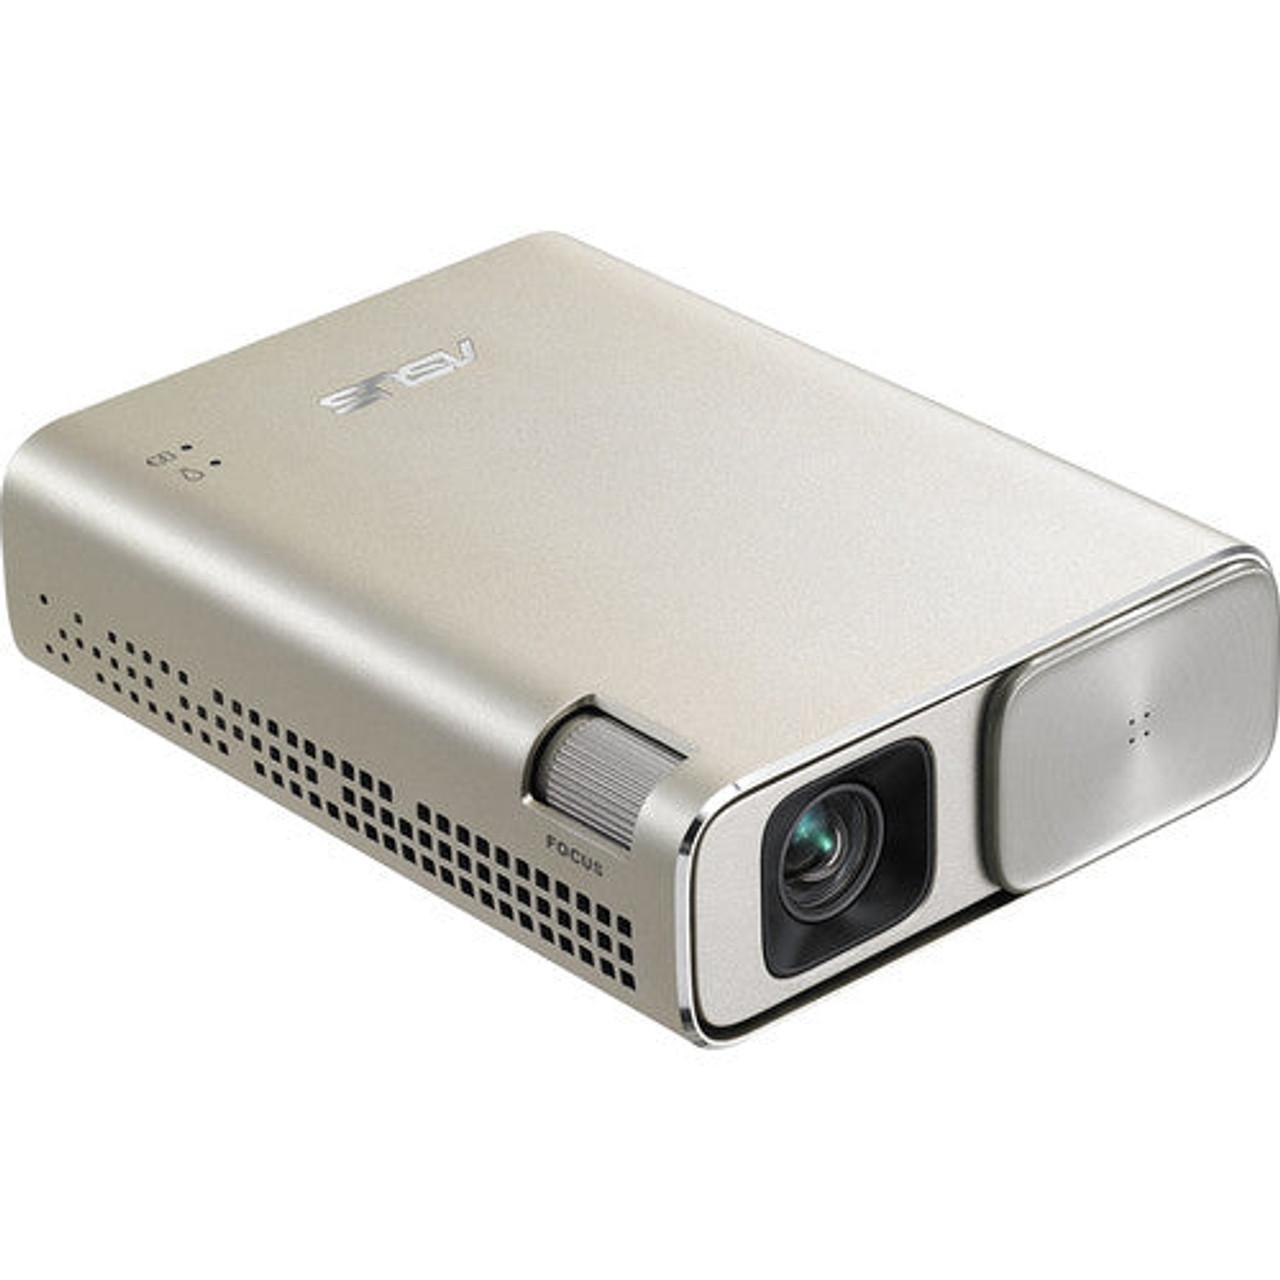 ASUS A90LJ0080-B01540-R ZenBeam Go E1Z WVGA Pico Projector Certified Refurbished